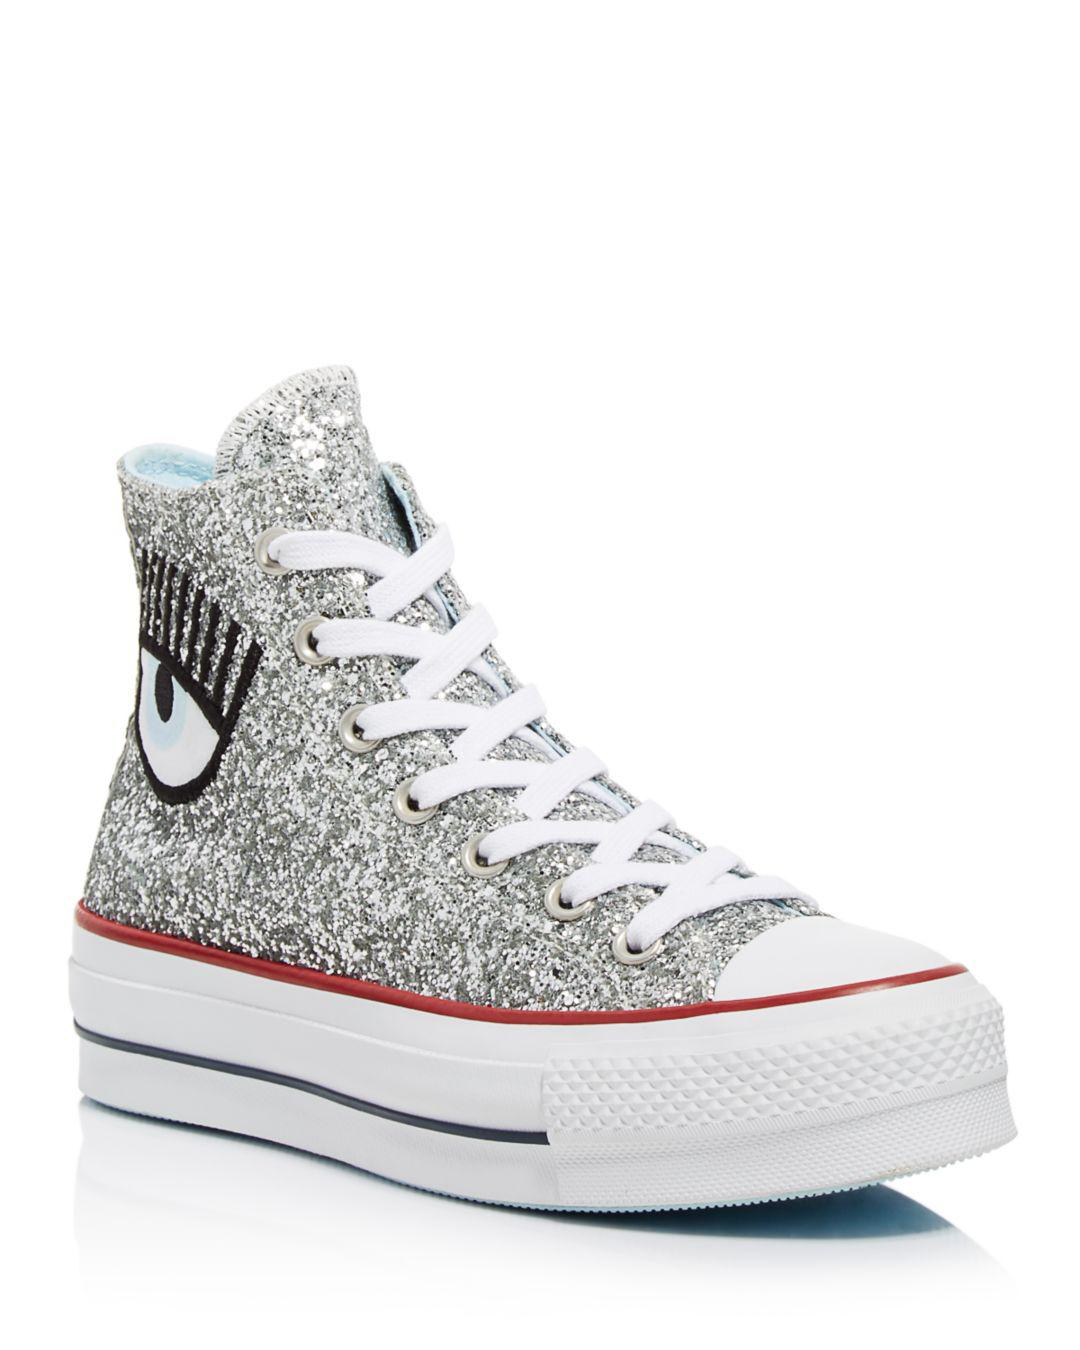 Converse X Chiara Ferragni Women's Chuck Taylor Glitter High Top Sneakers in Metallic - Save 42% - Lyst